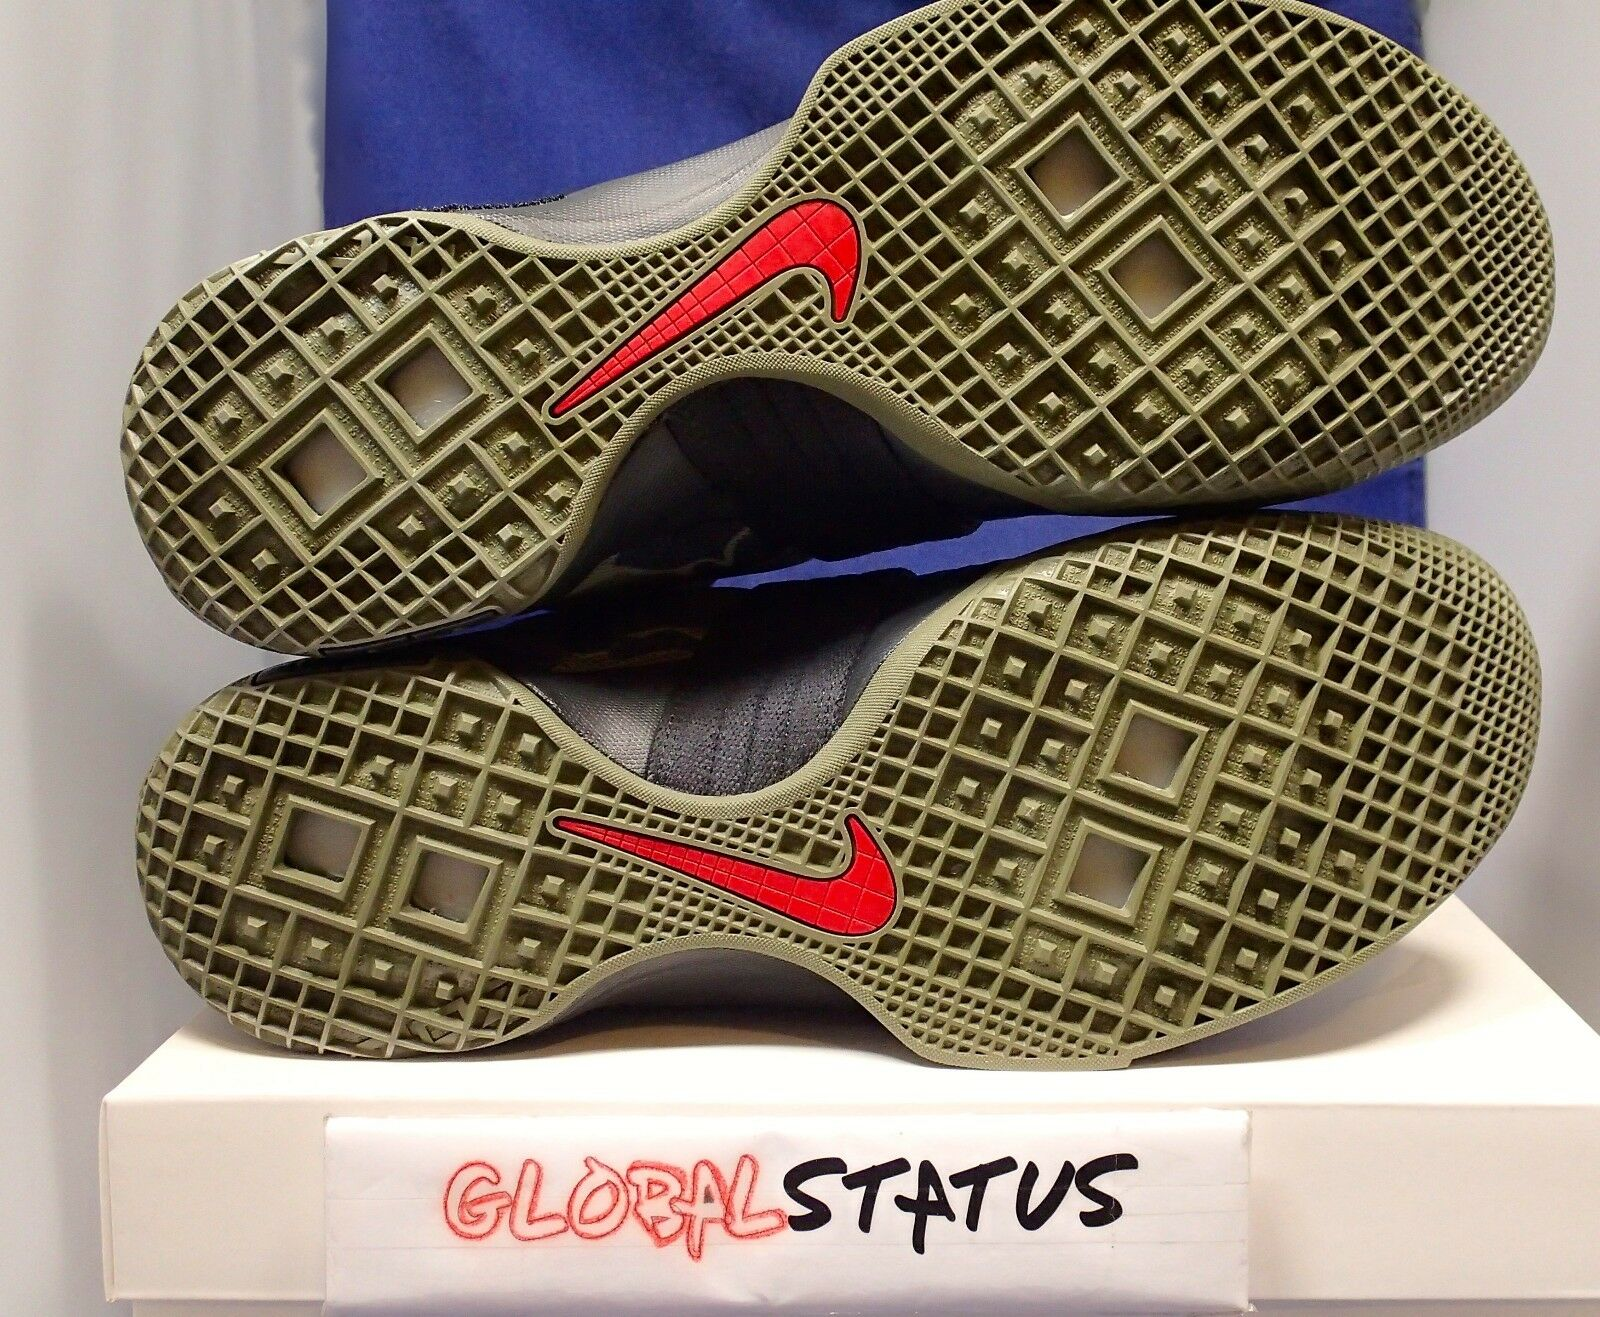 reputable site 7fbdb 95bd2 ... Nike Hombre LeBron Soldier 10 GPa CAMO CAMO CAMO Olive zapatos negros  844378 022 tamaño 11